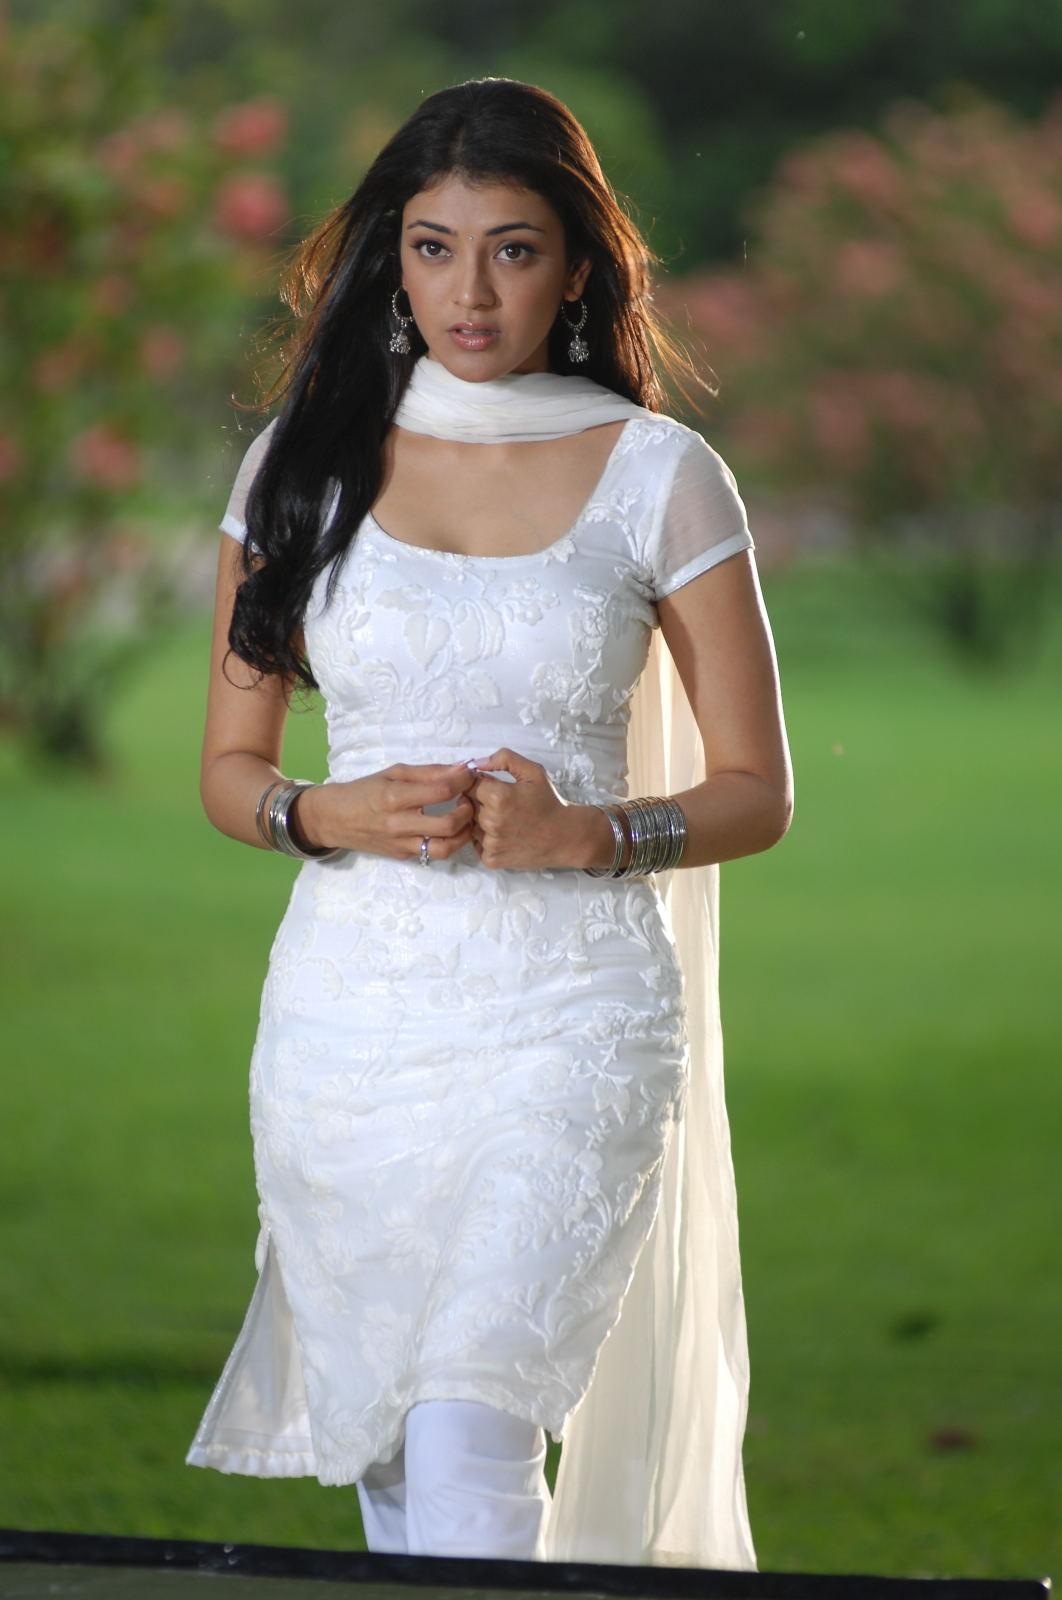 Kajal Aggarwal Sad Face Photos In White Dress